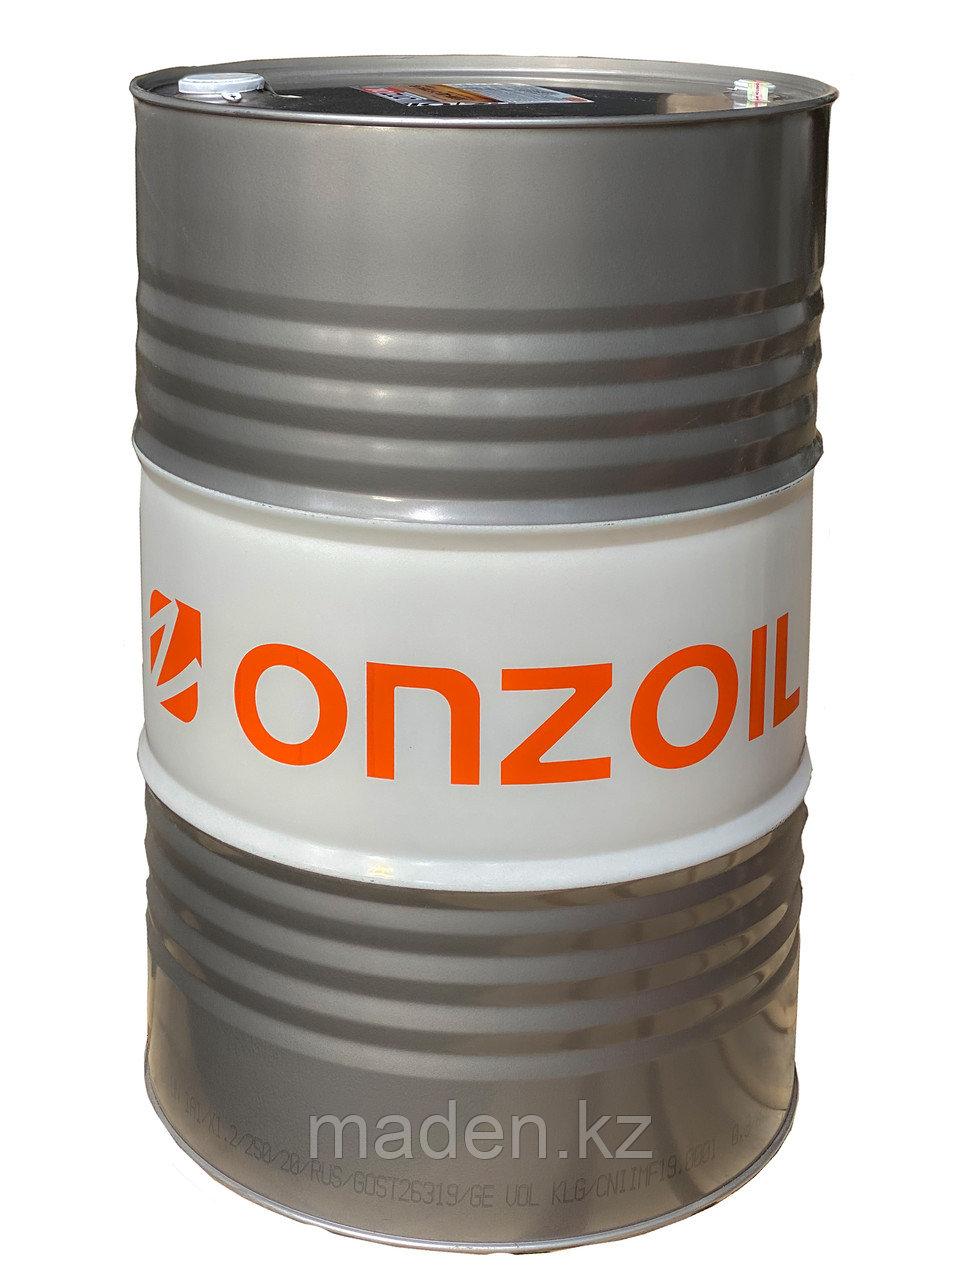 Моторное масло ONZOIL 10W40 Turbo Diesel Lux CF-4 205.0